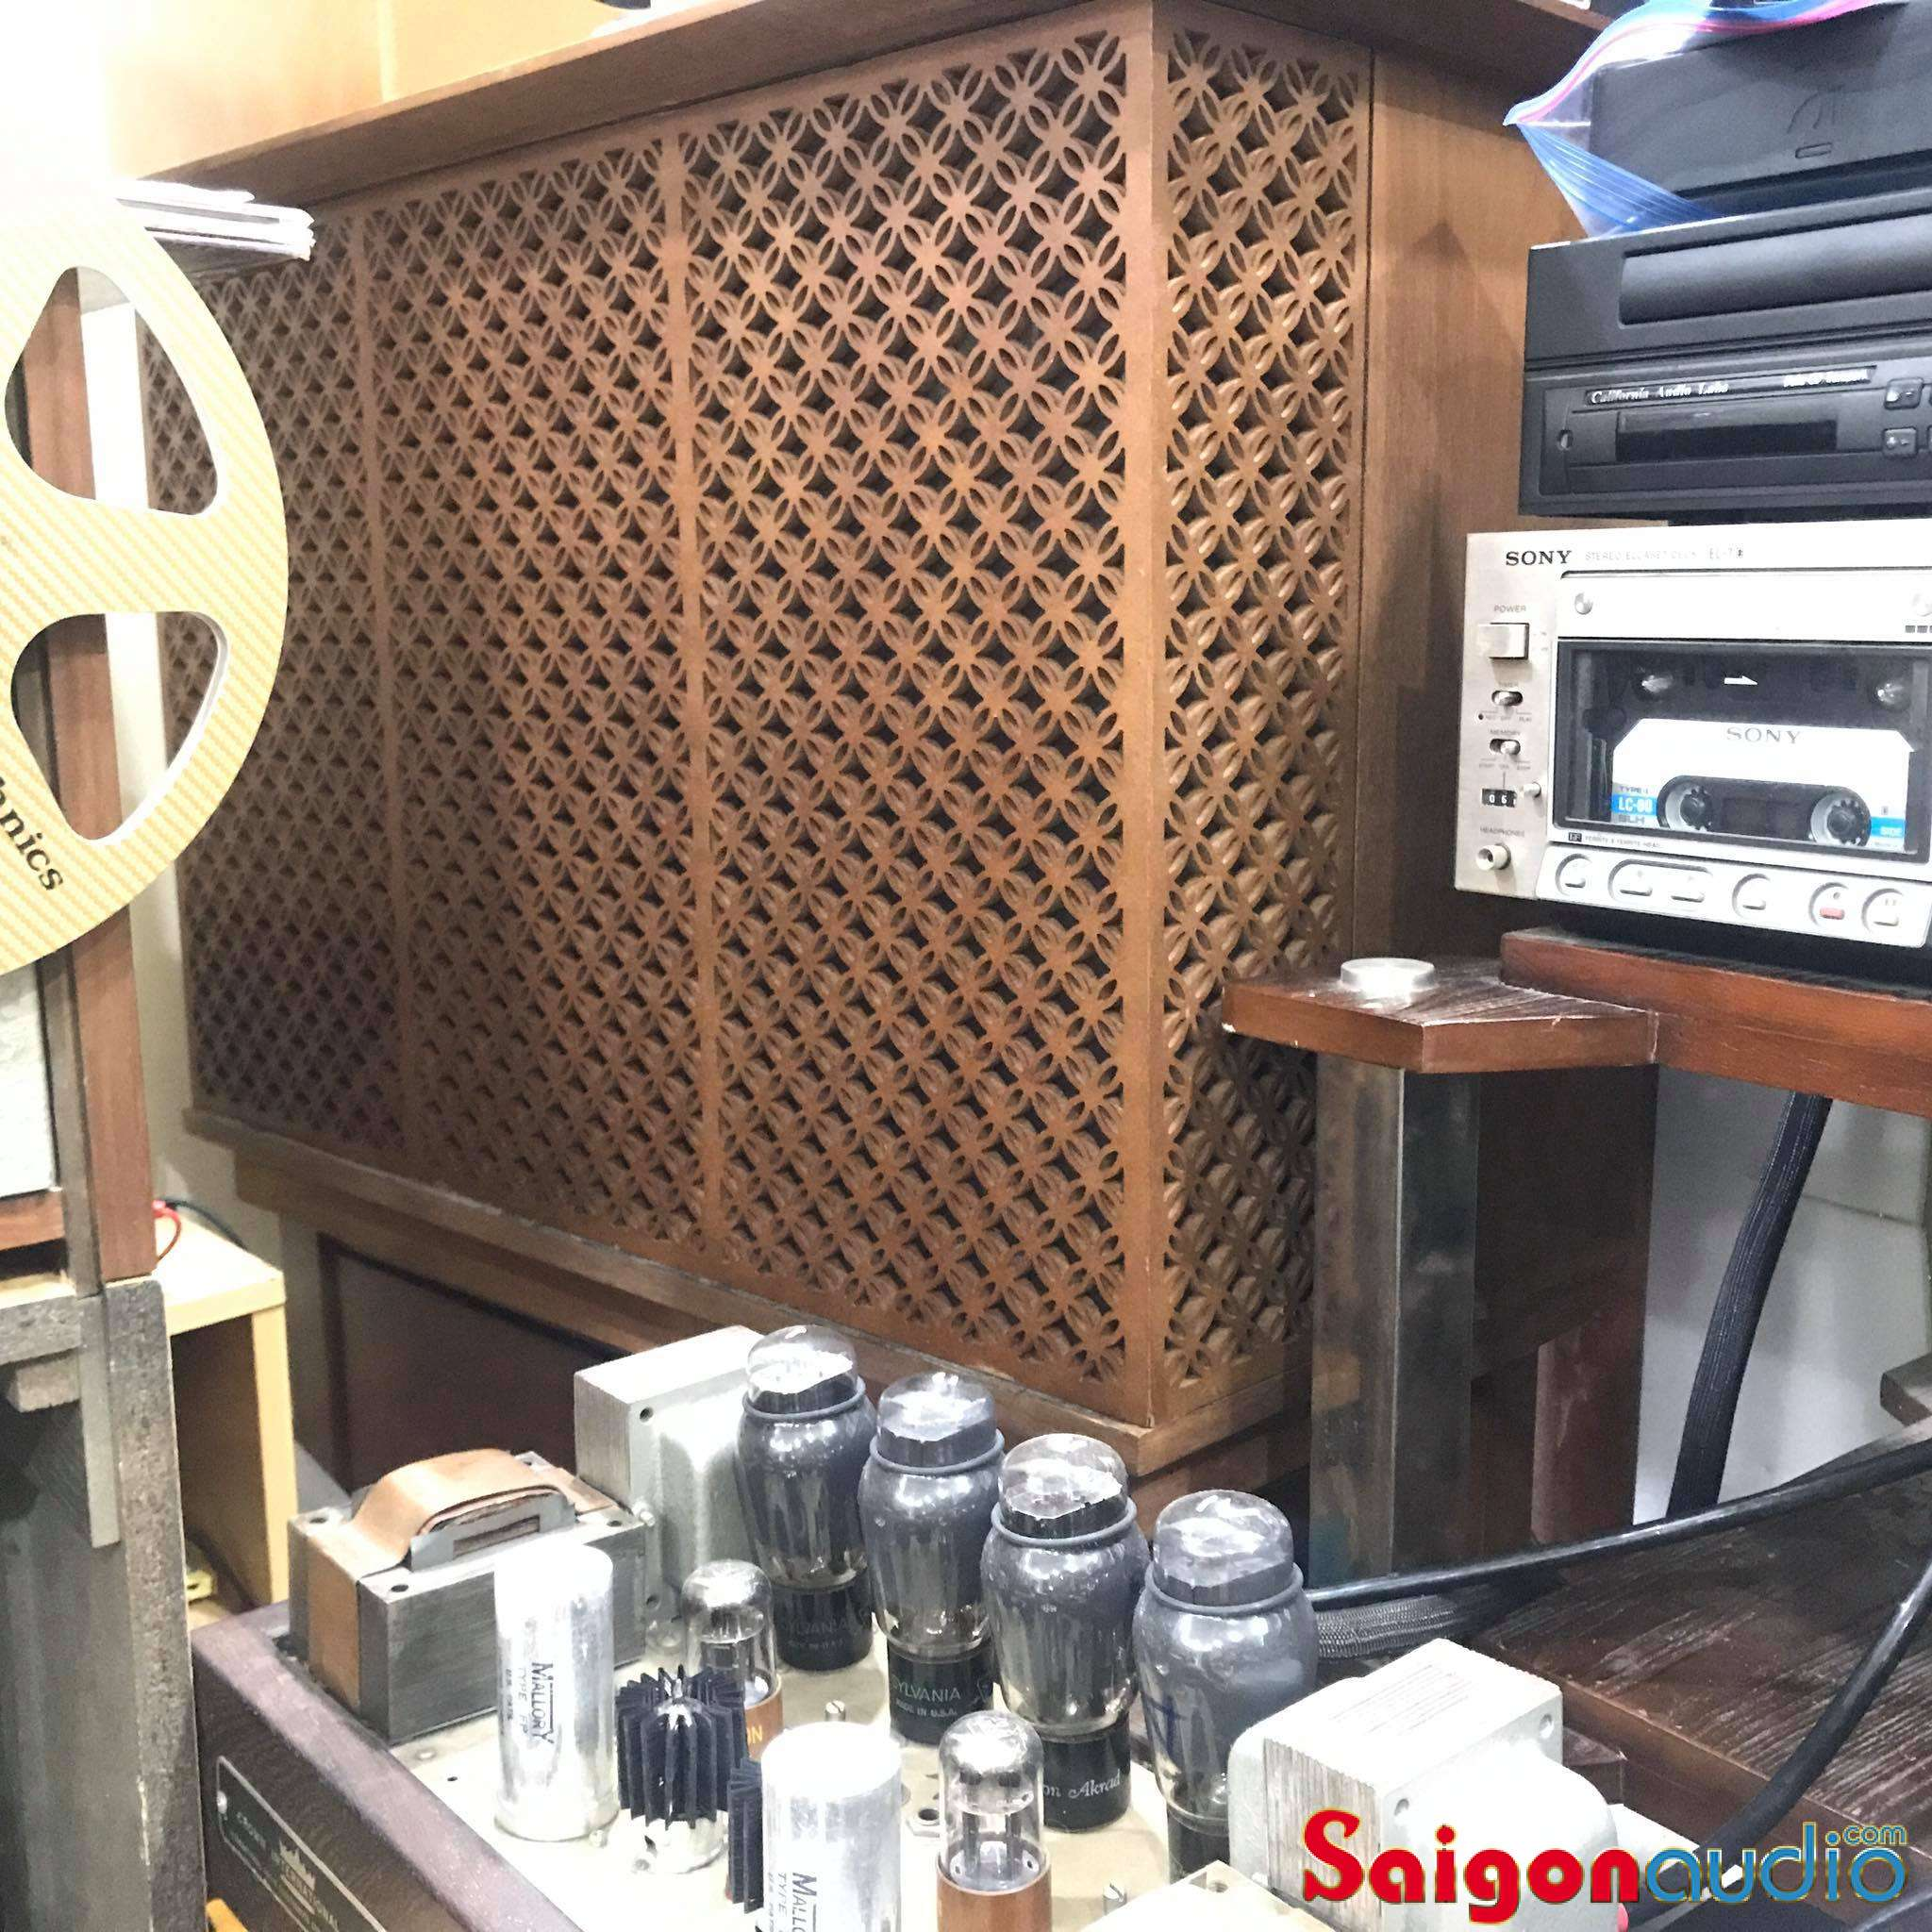 Dây loa, dây tín hiệu, dây nguồn, ampli, CDP, loa.. [ID=555] SaigonAudio.com - 10